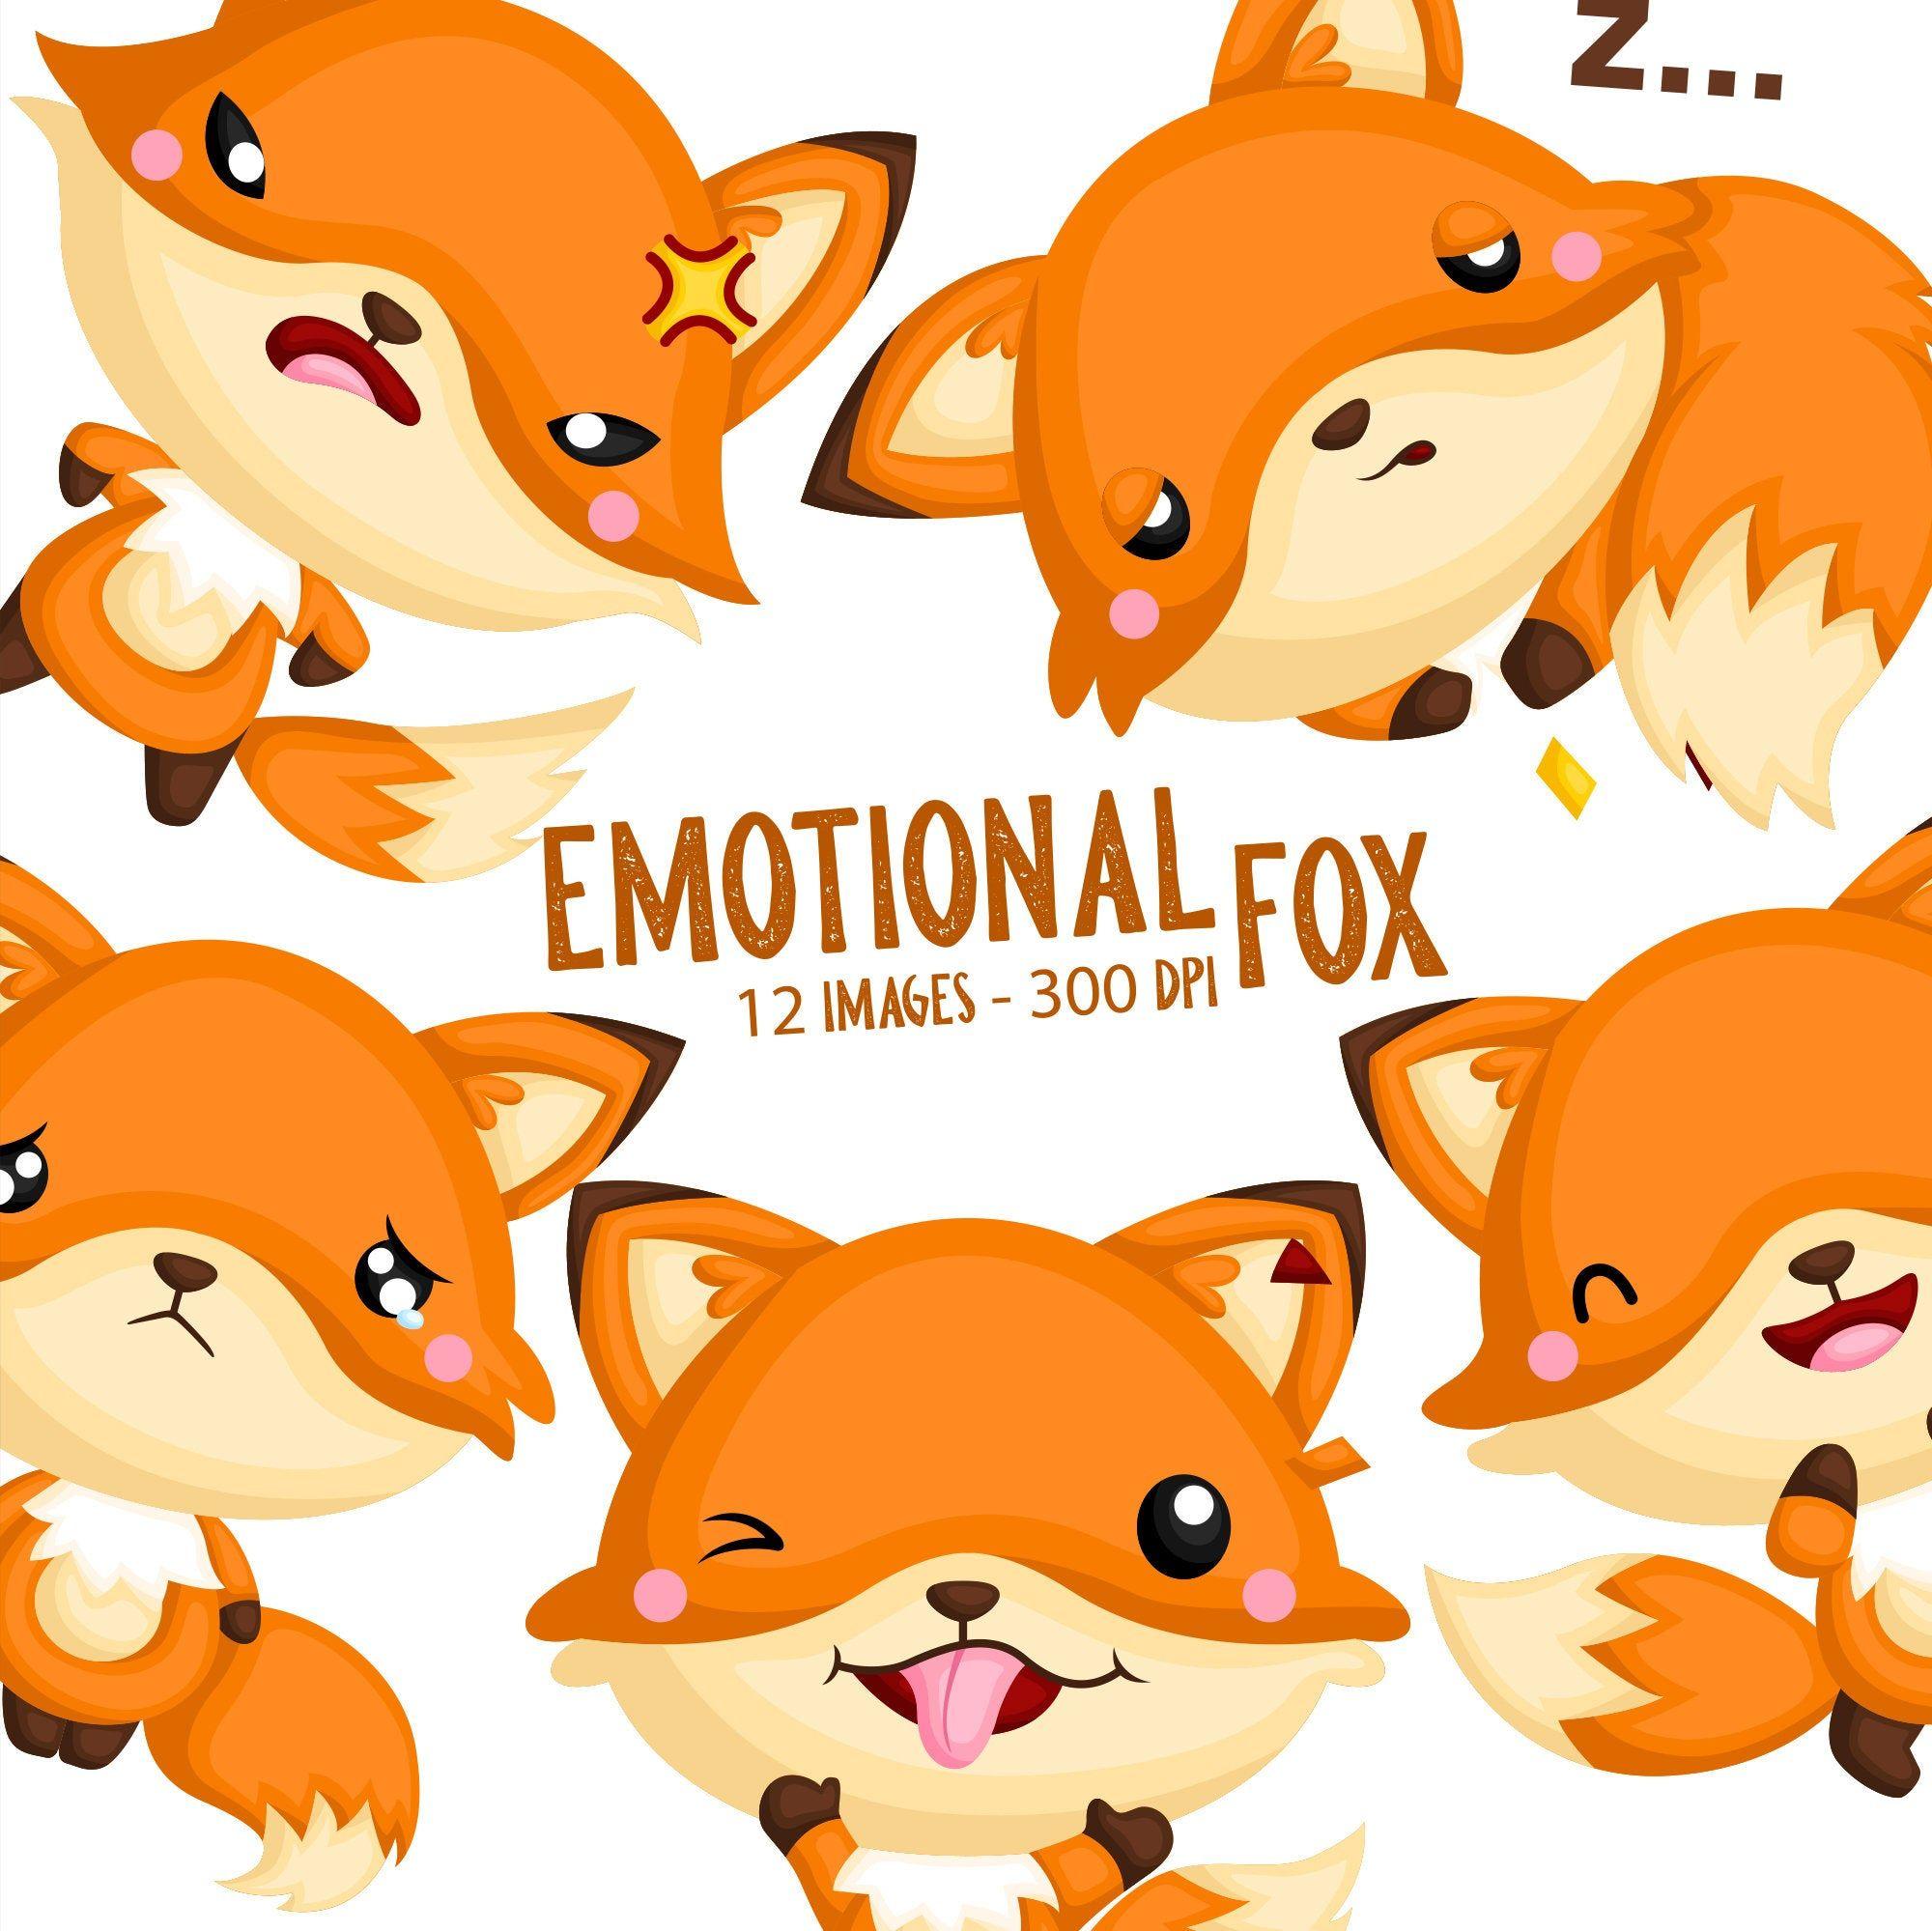 Emotional Fox Clipart Cute Animal Clip Art Wild Animal Etsy In 2021 Baby Clip Art Cute Animal Clipart Clip Art